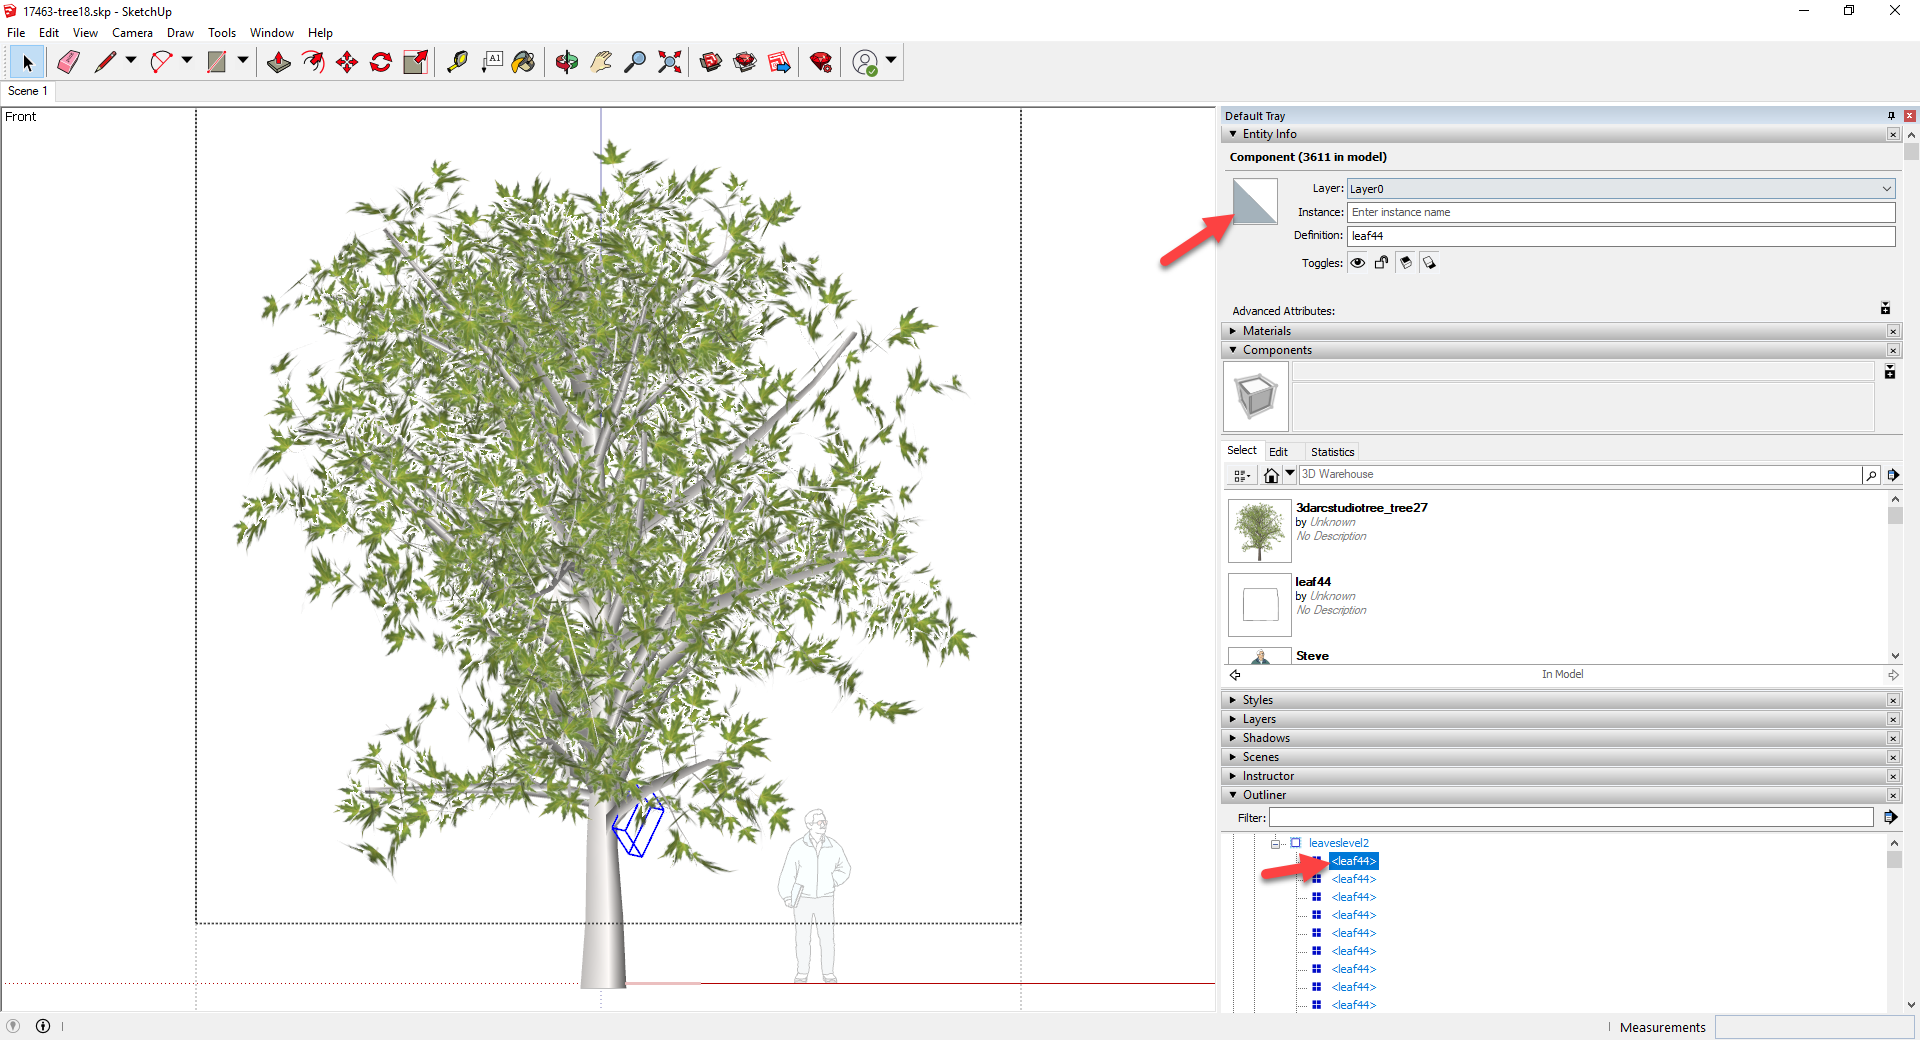 Sketchup import faced distortion - FlexSim Community